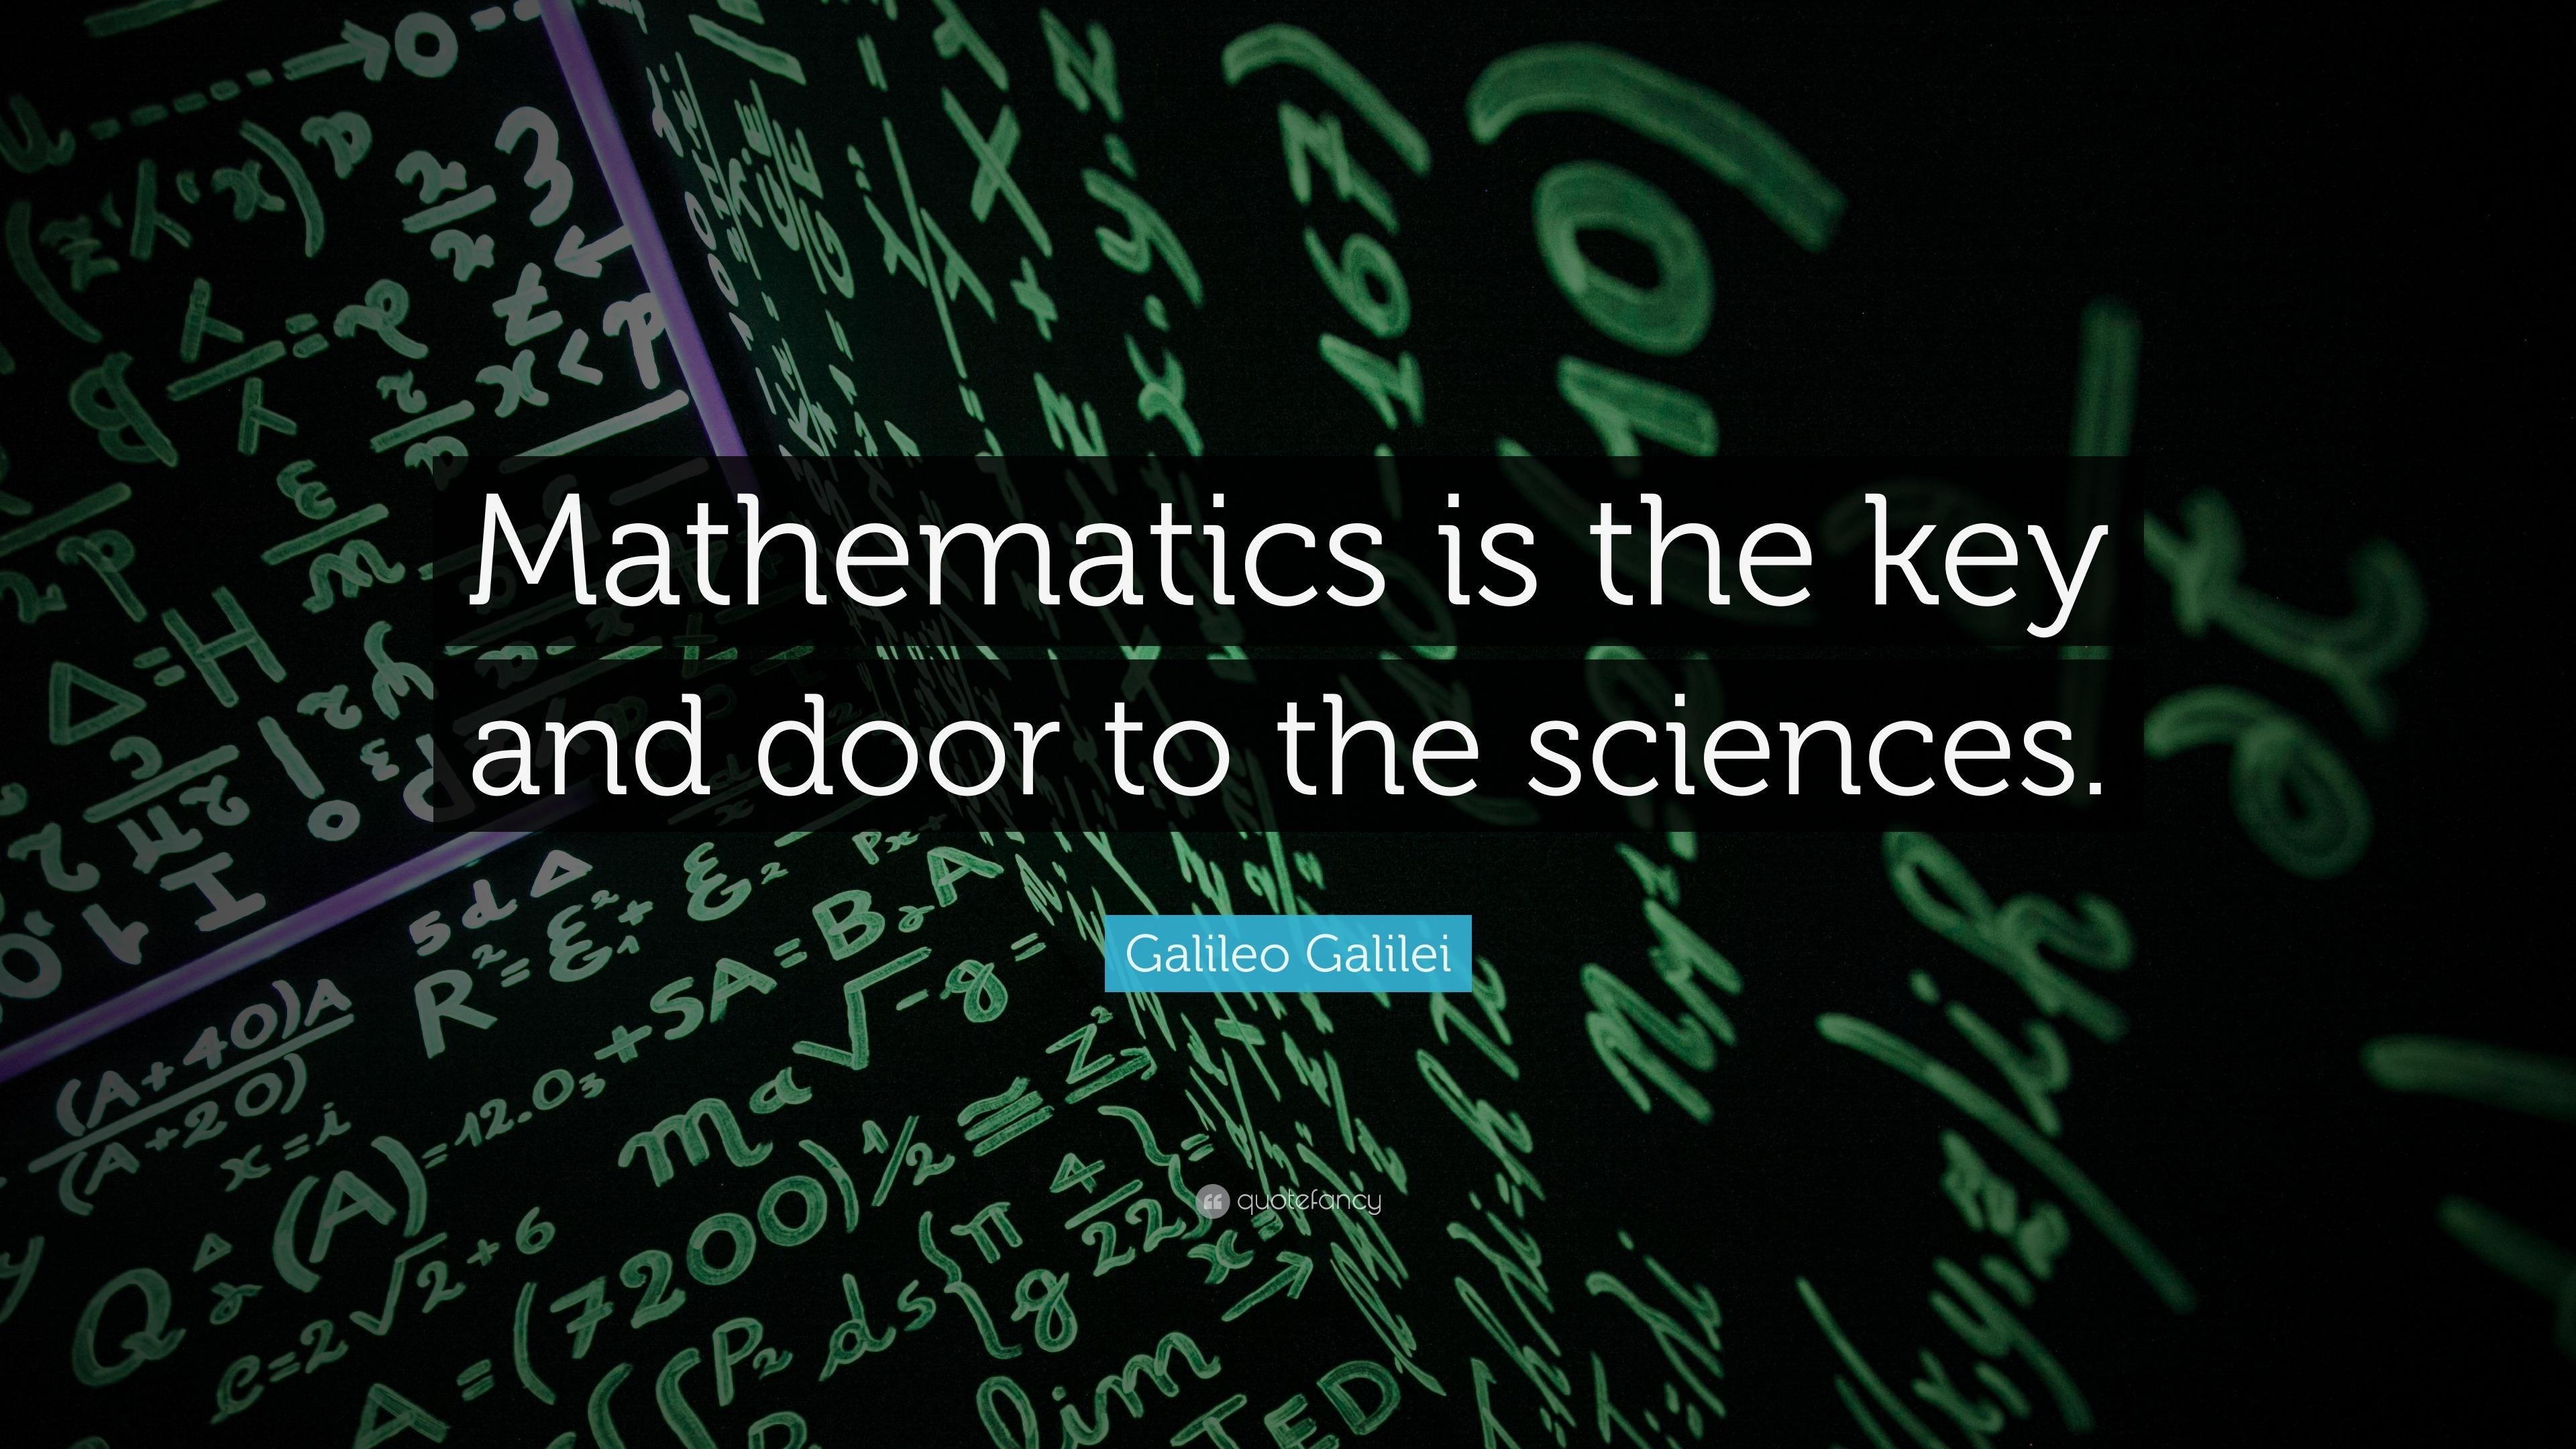 Galileo Galilei Quote u201cMathematics is the key and door to the sciences.u201d  sc 1 st  Quotefancy & Galileo Galilei Quote: u201cMathematics is the key and door to the ...